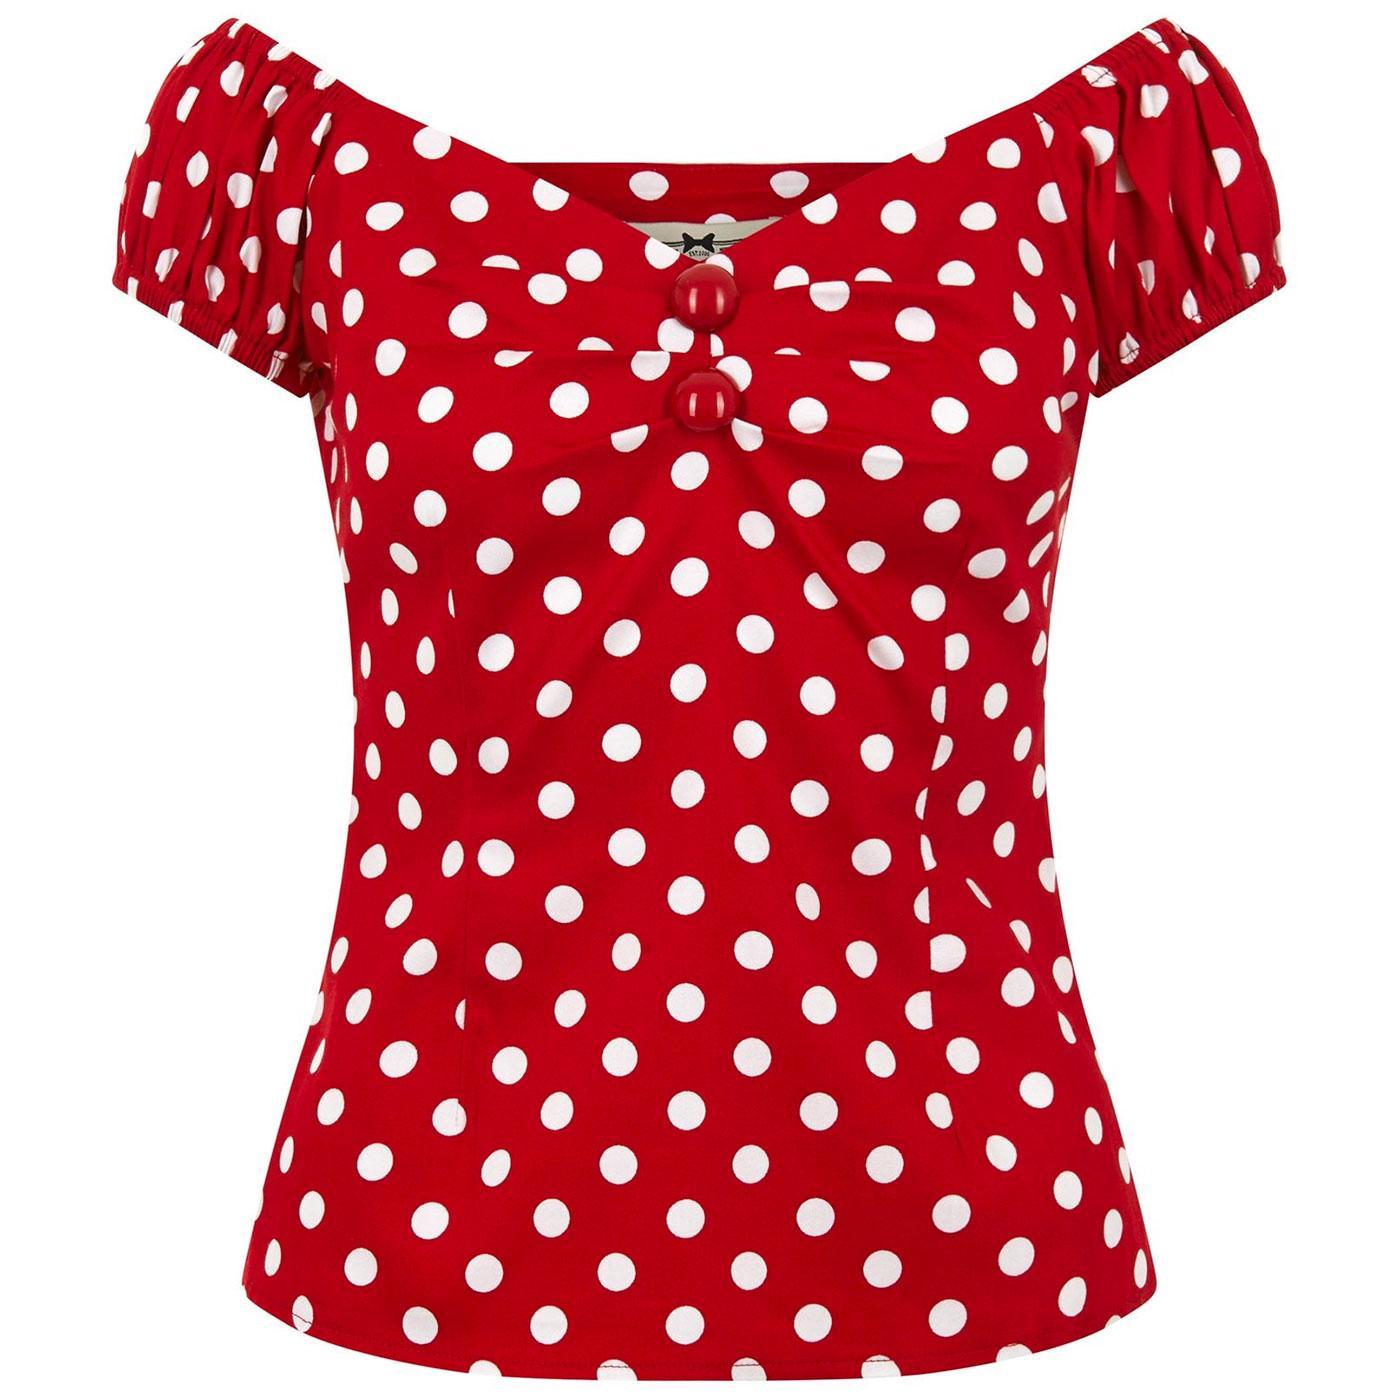 Dolores COLLECTIF Retro 50s Polka Dot Top (Red)